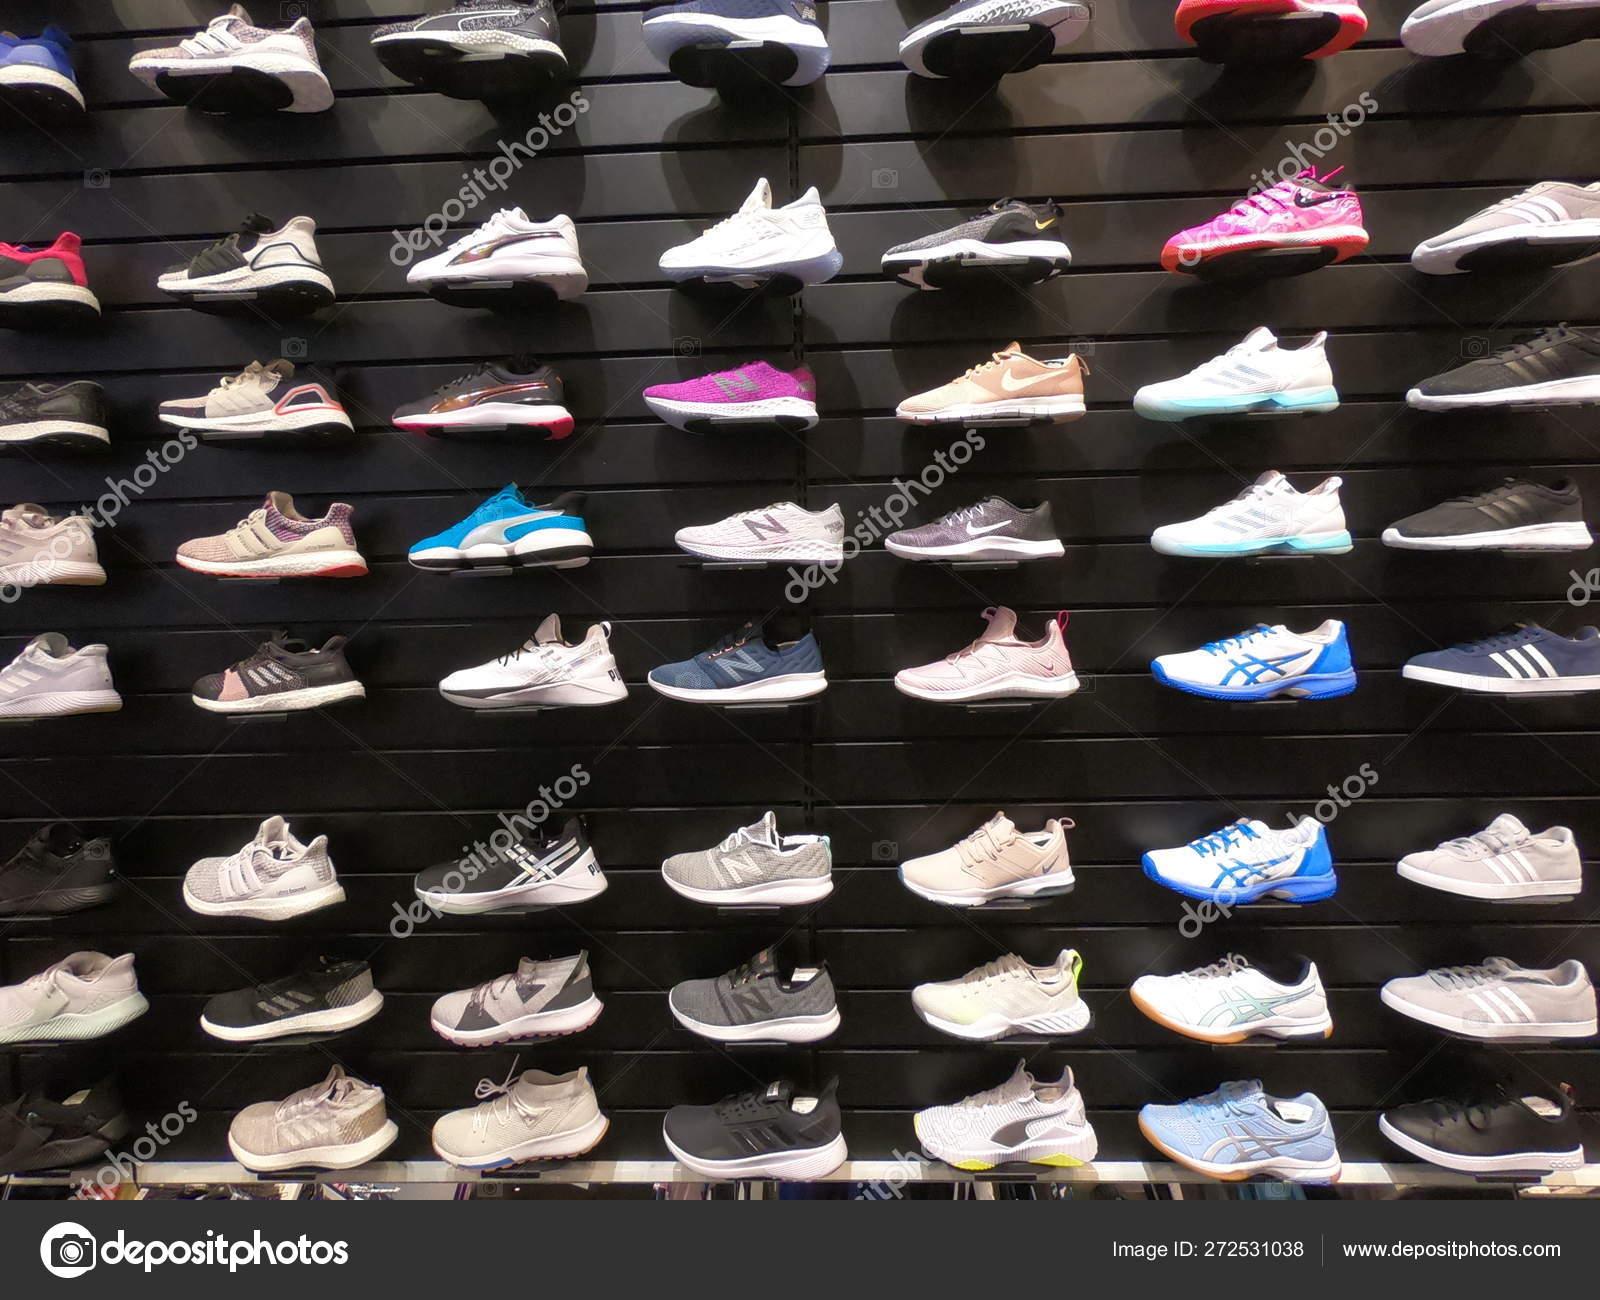 Dubai UAE May 2019 - Big collection of